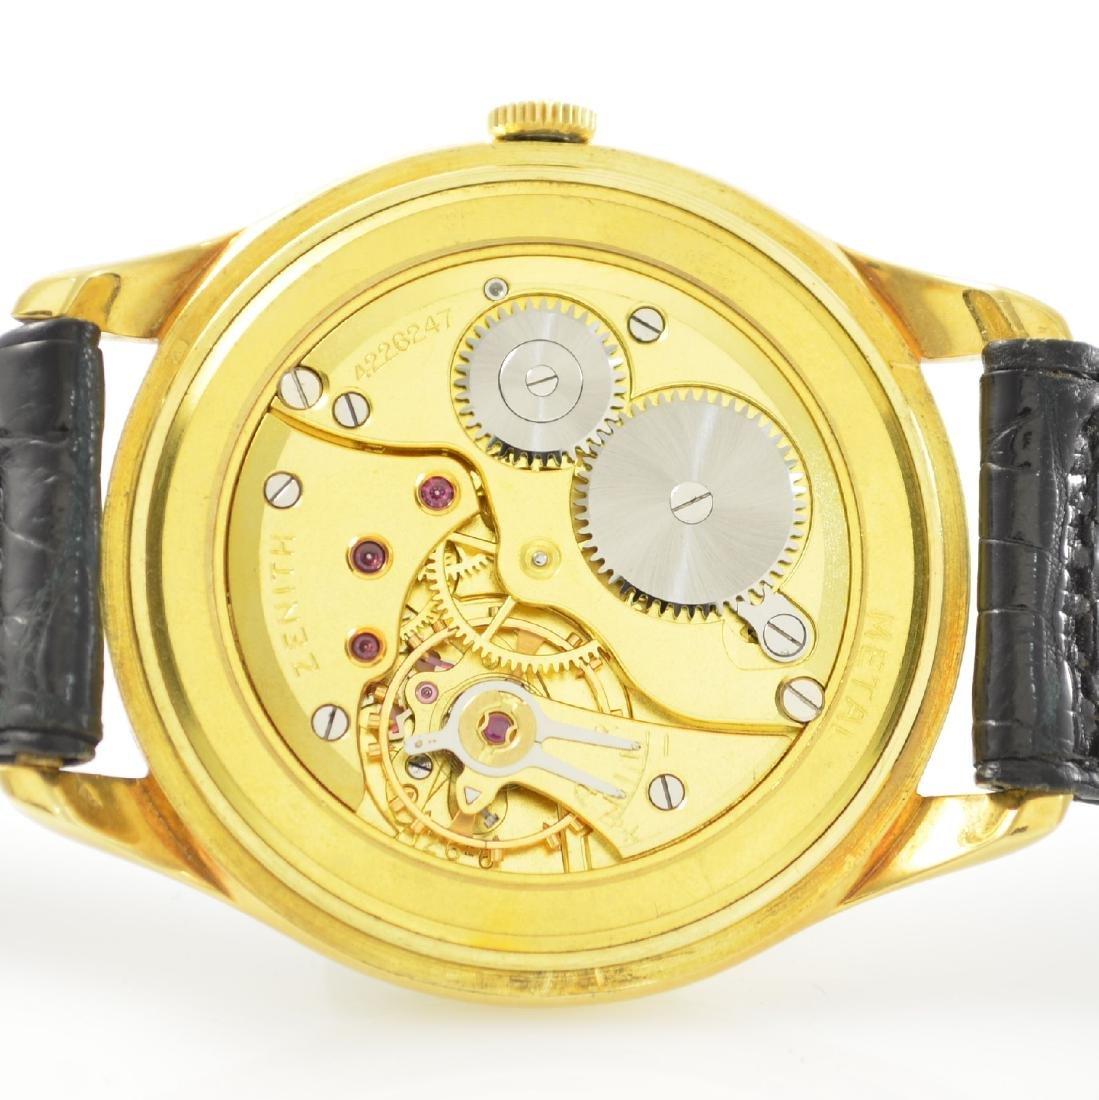 ZENITH oversized 18k yellow gold gents wristwatch - 8